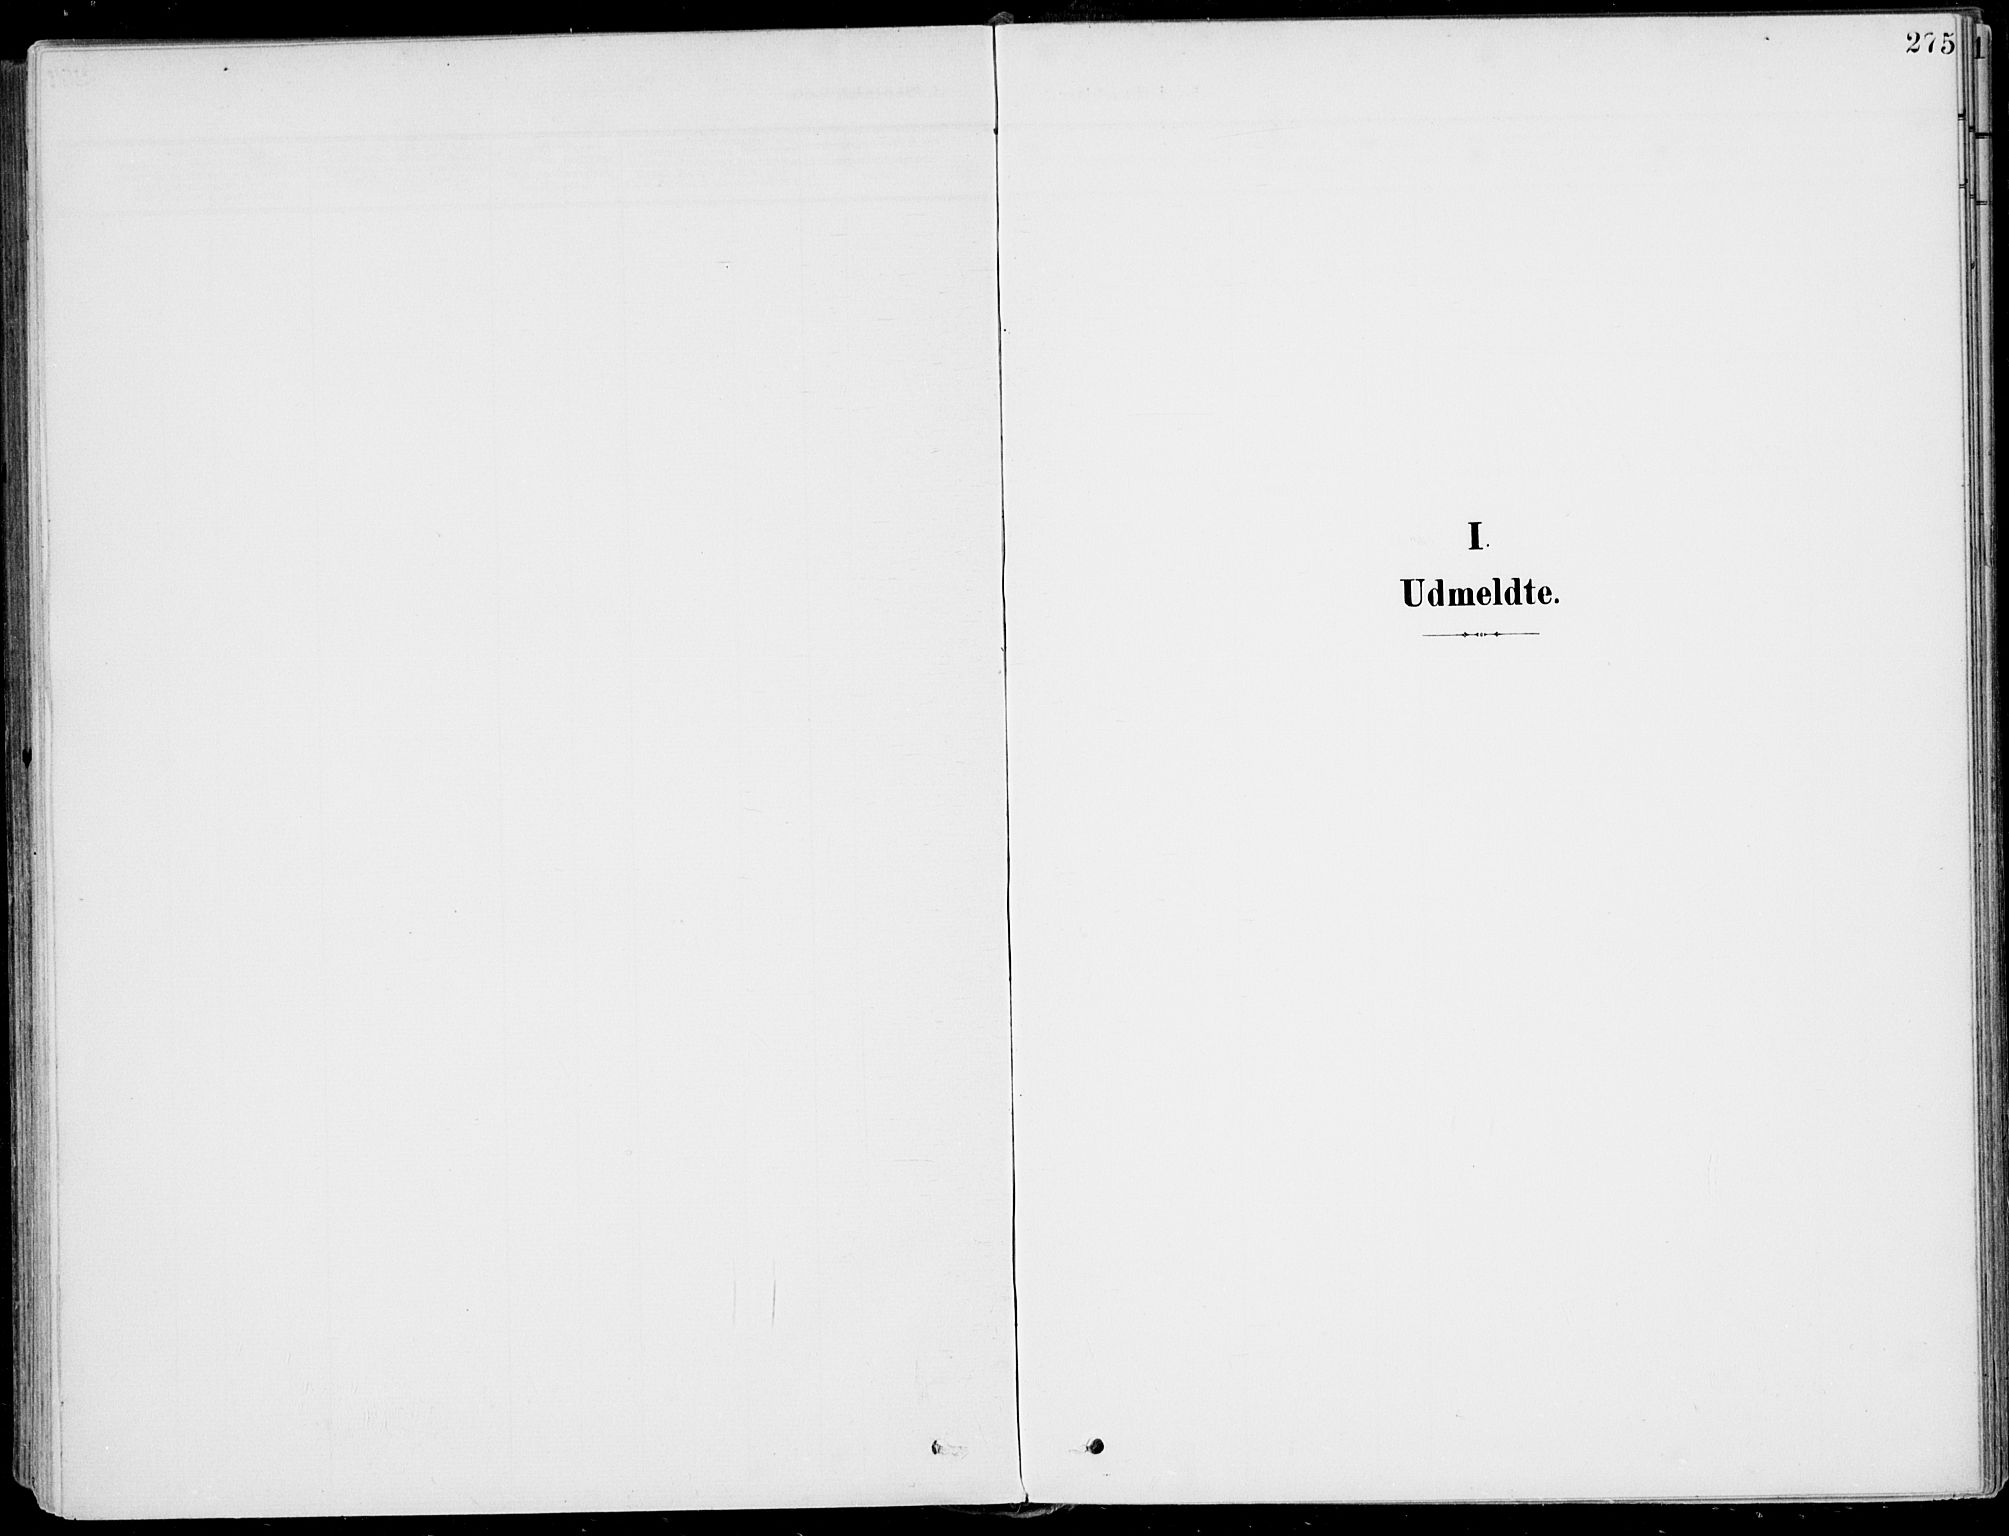 SAKO, Sigdal kirkebøker, F/Fb/L0002: Ministerialbok nr. II 2, 1901-1914, s. 275